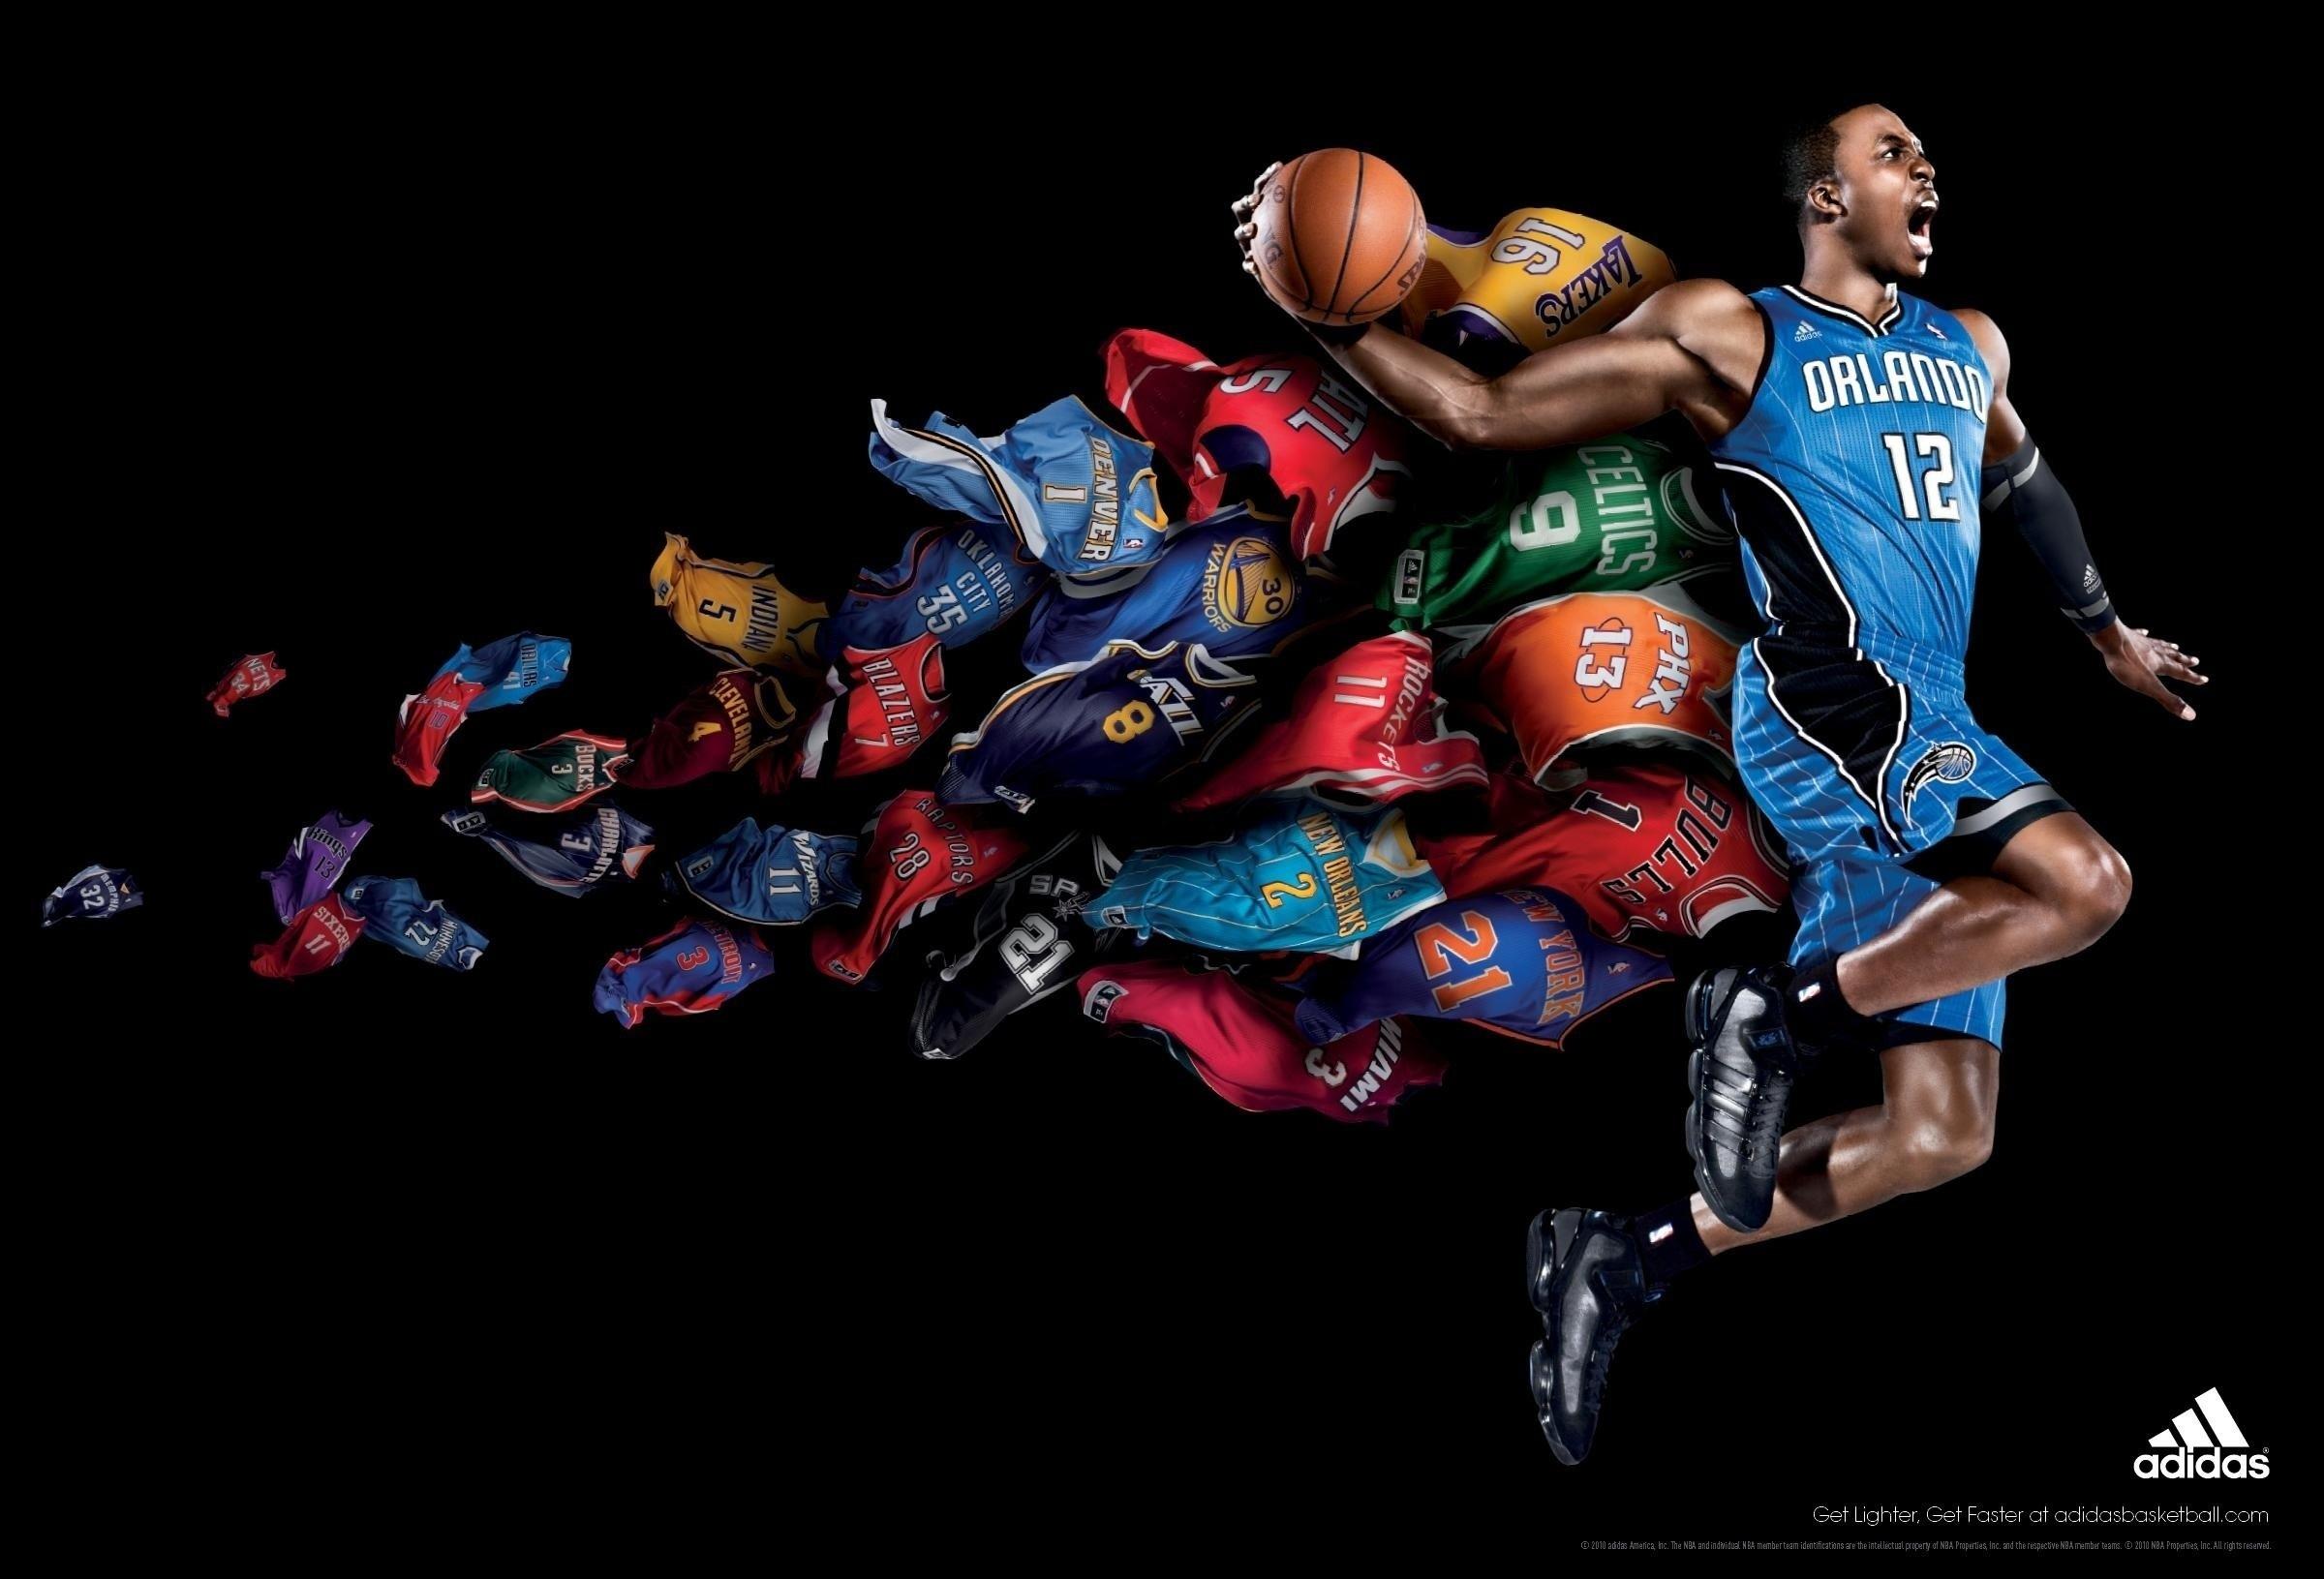 cool 3d wallpaper hd basketball (68+ images)